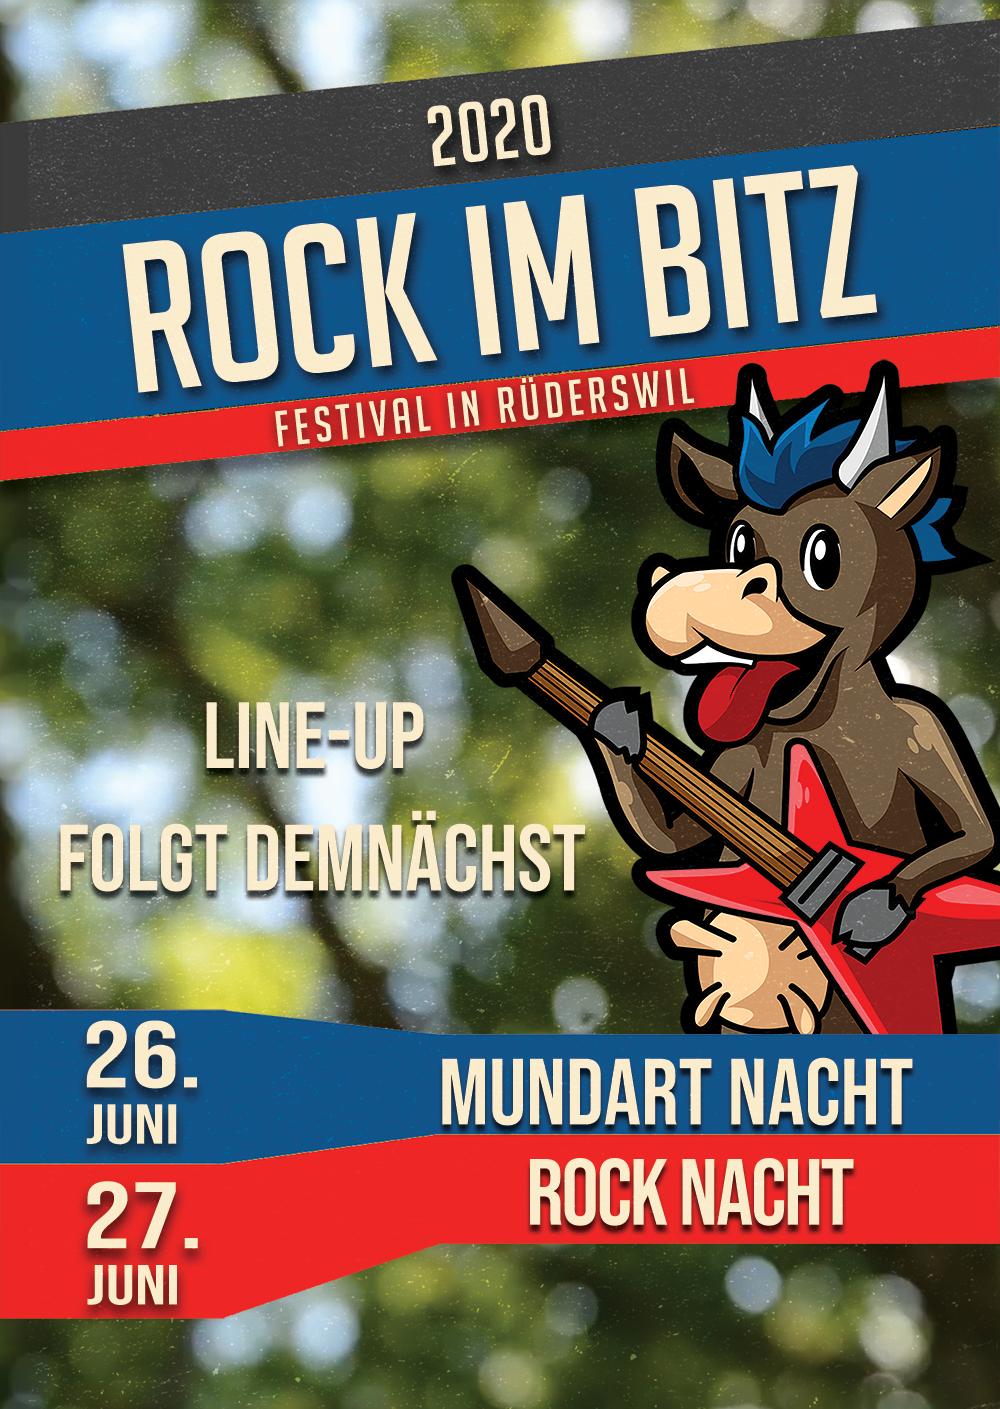 Rock im Bitz Header 2020 Mobile